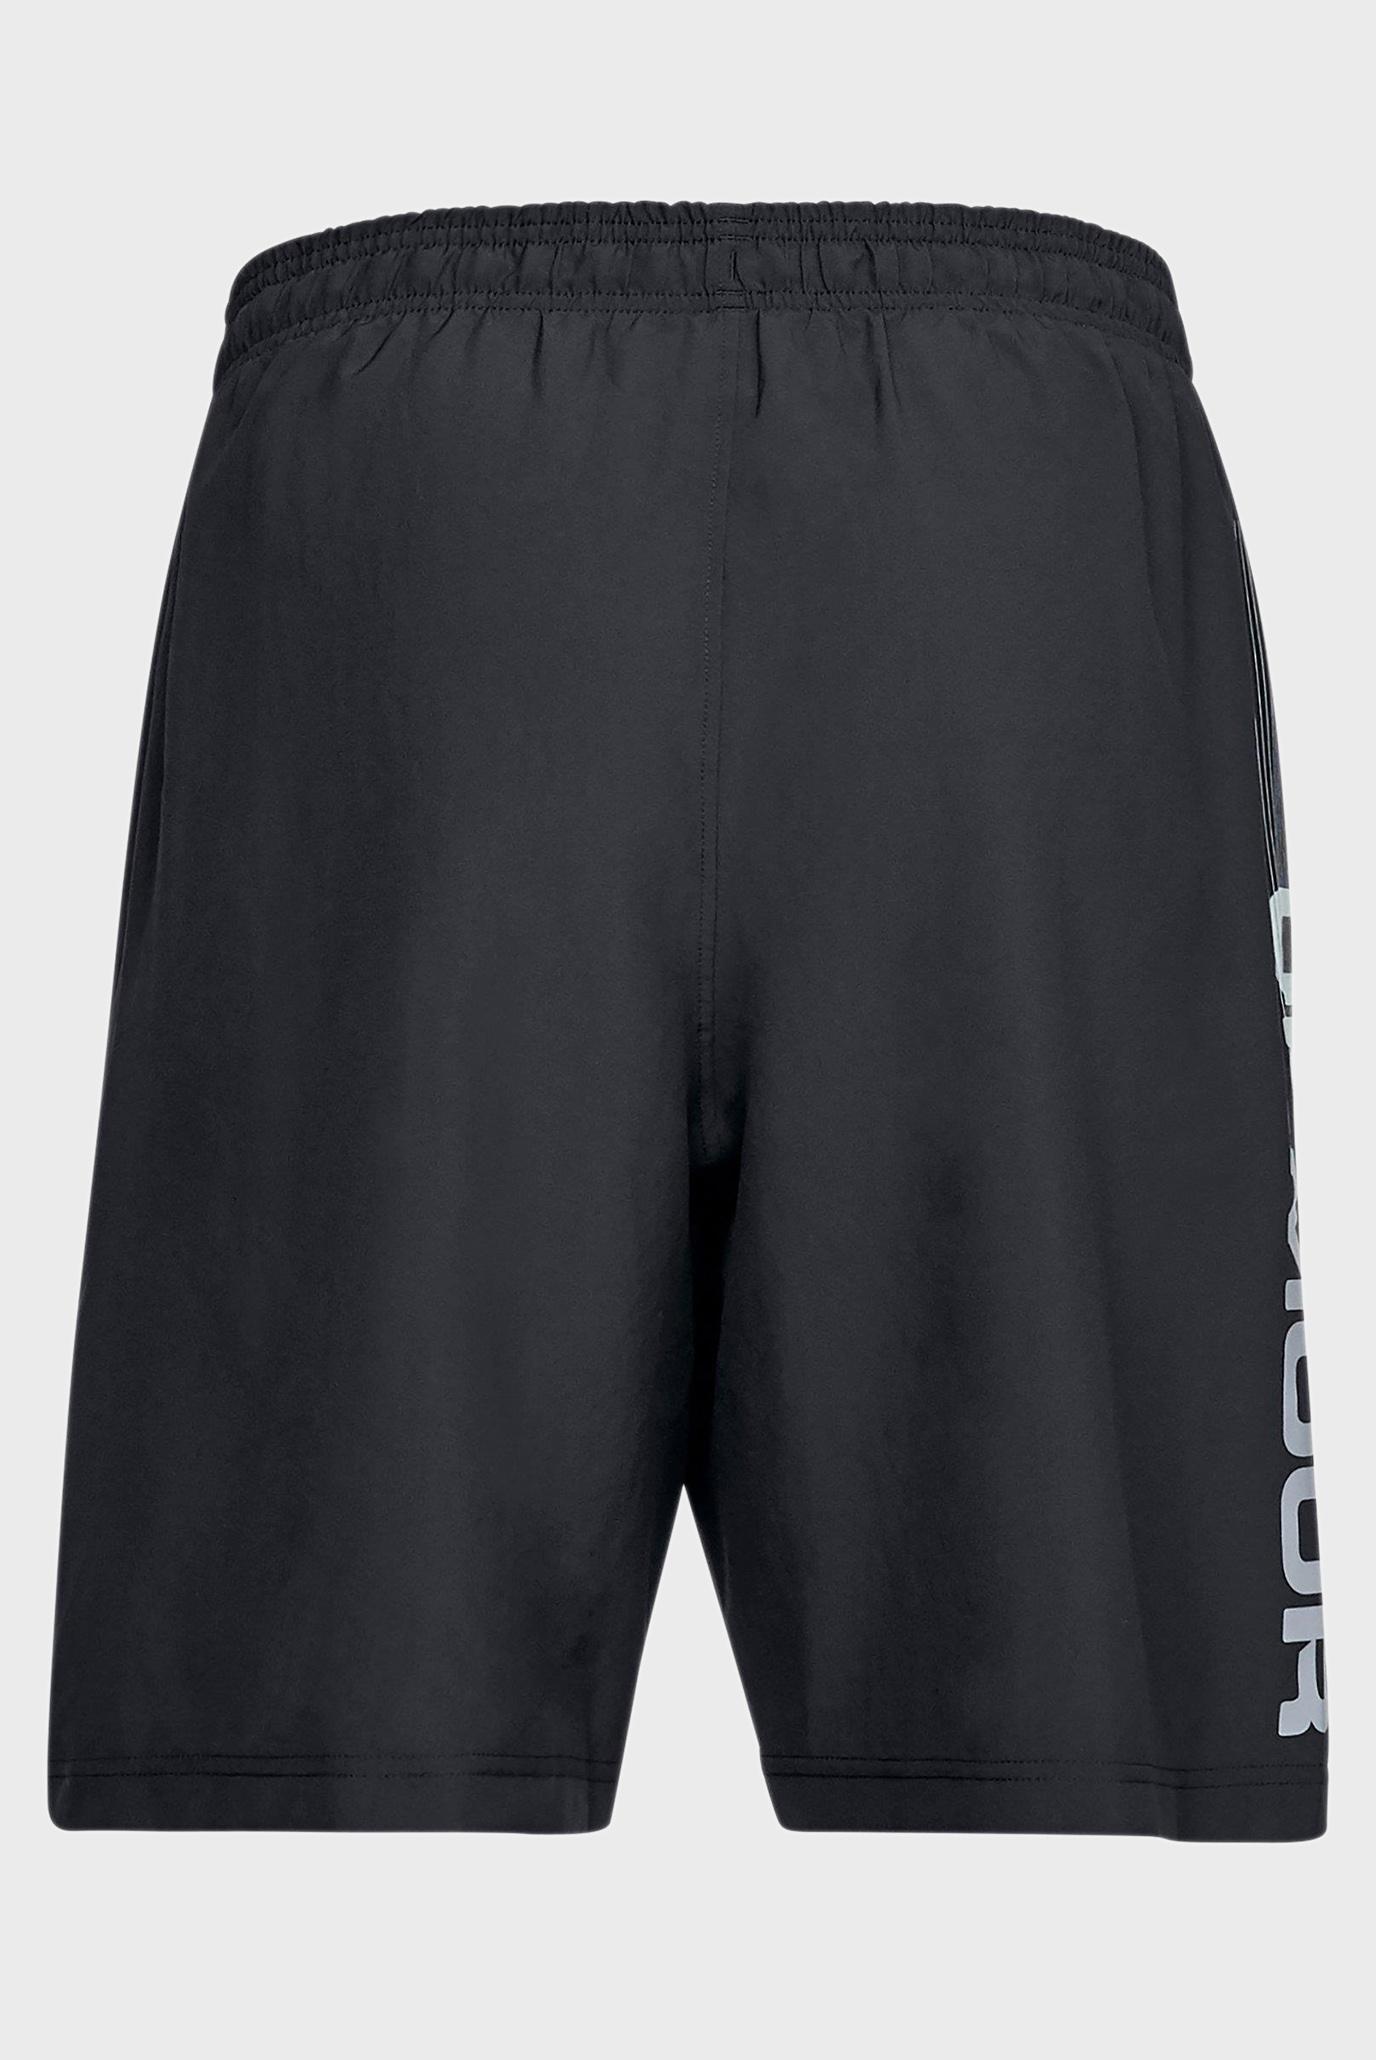 Мужские черные шорты Woven Graphic Wordmark Short Under Armour